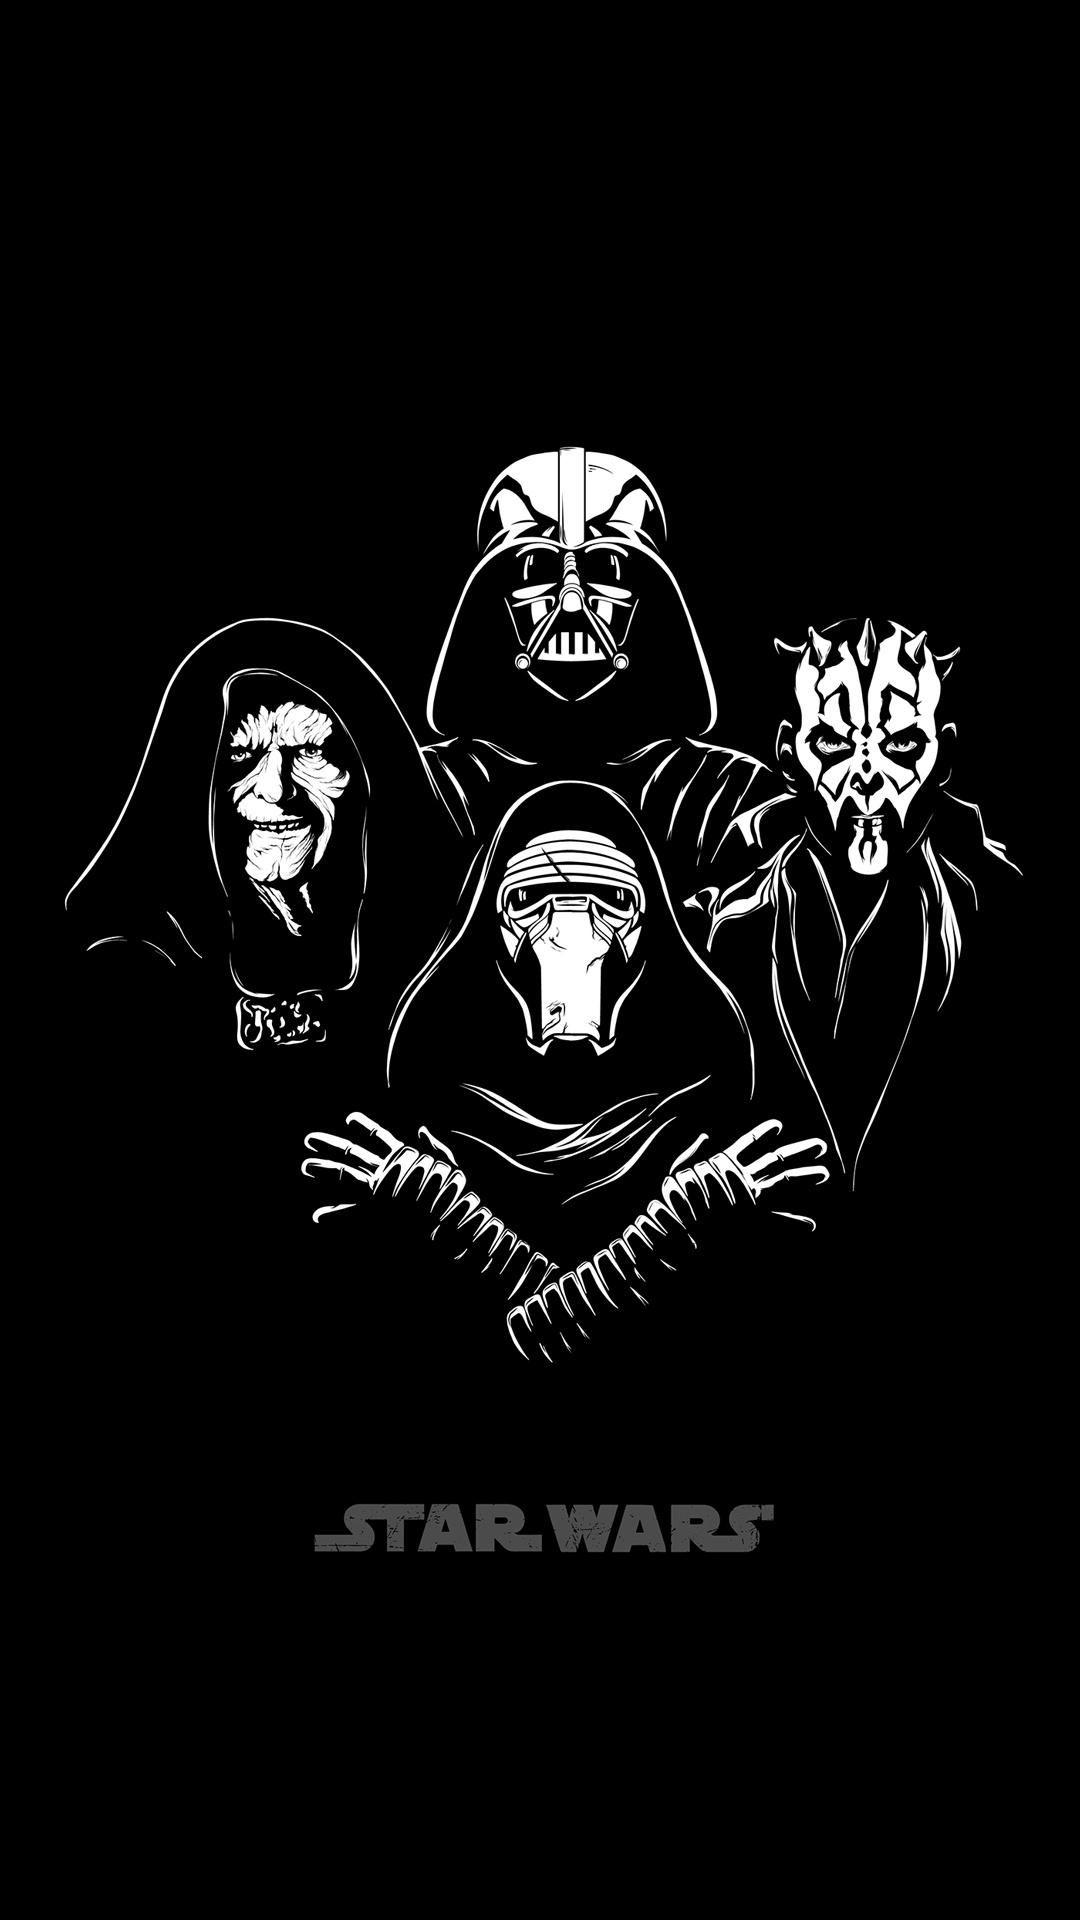 Pin By Zach Lesher On Star Wars Star Wars Wallpaper Dark Side